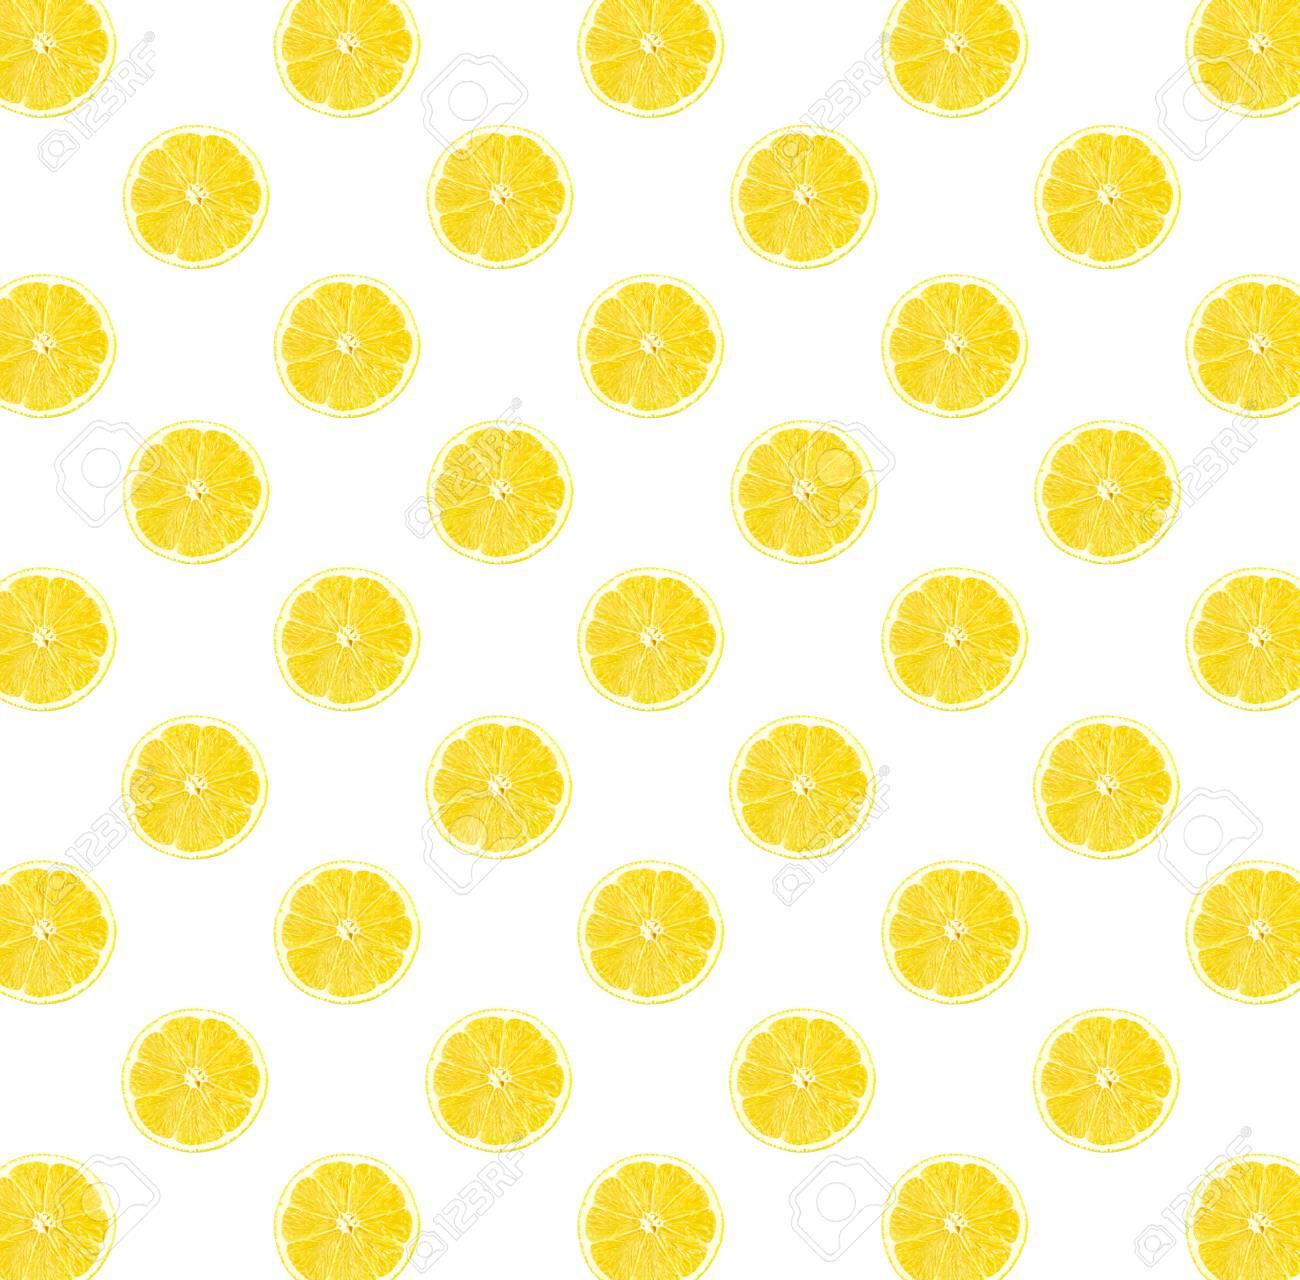 Fresh Yellow Lemon Photographic Pattern Lemon Wallpaper Isolated